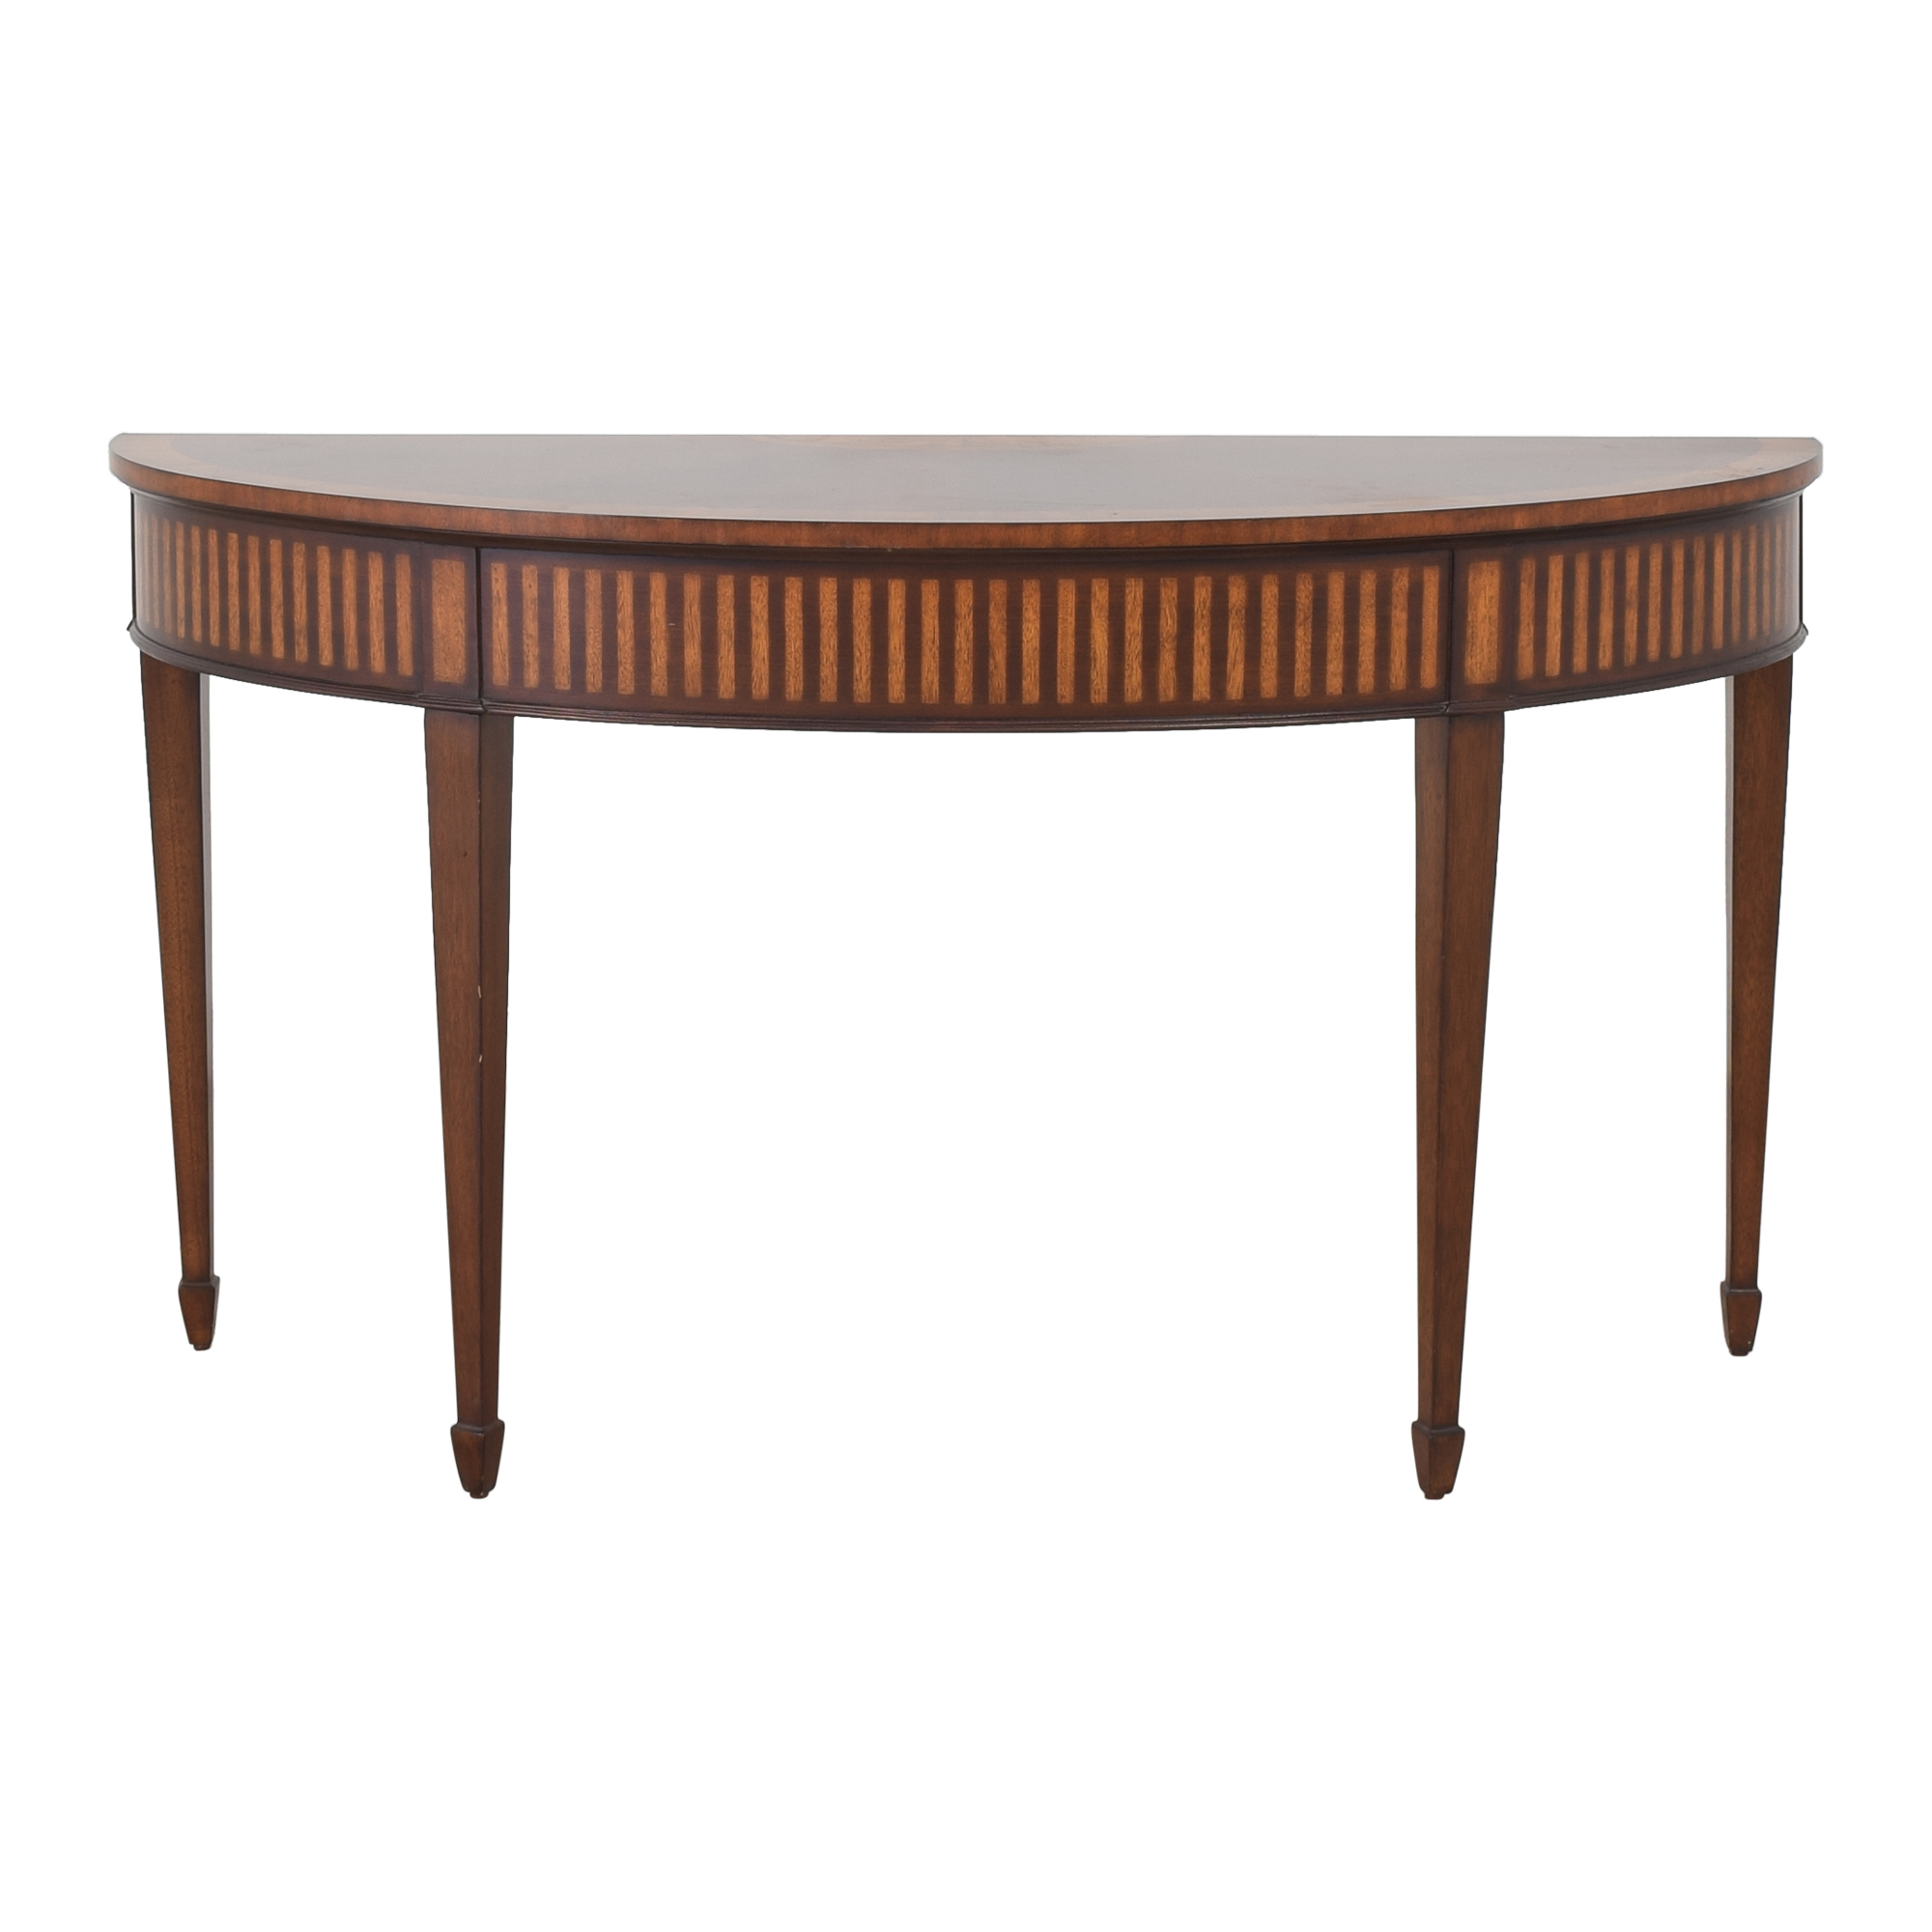 Ethan Allen Newman Demilune Sofa Table / Accent Tables